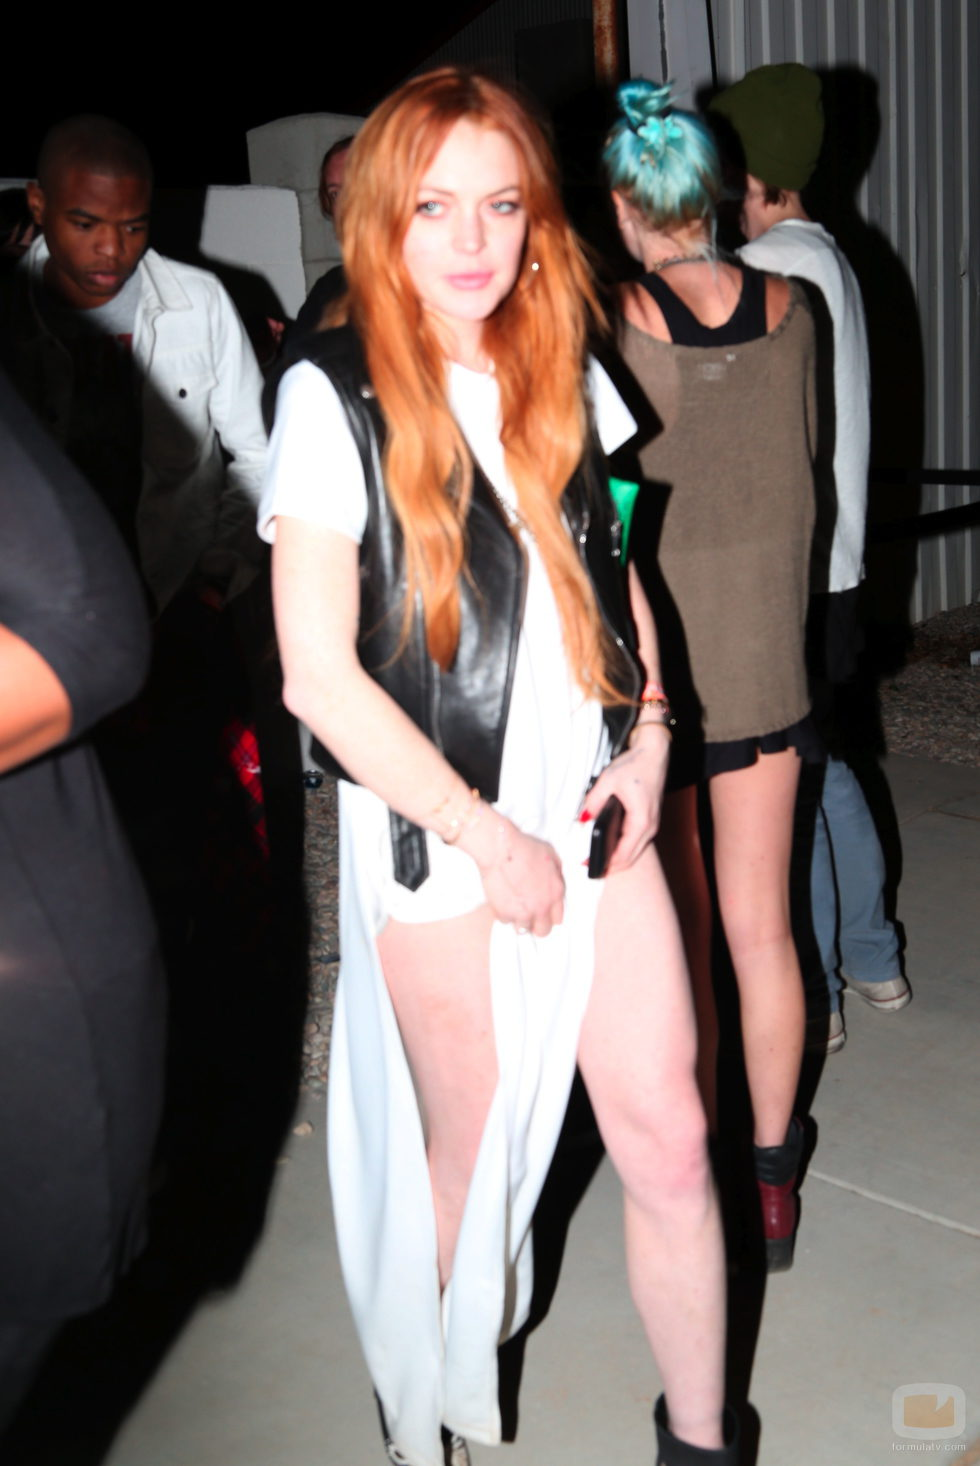 Lindsay Lohan en el Festival de Música Coachella 2014